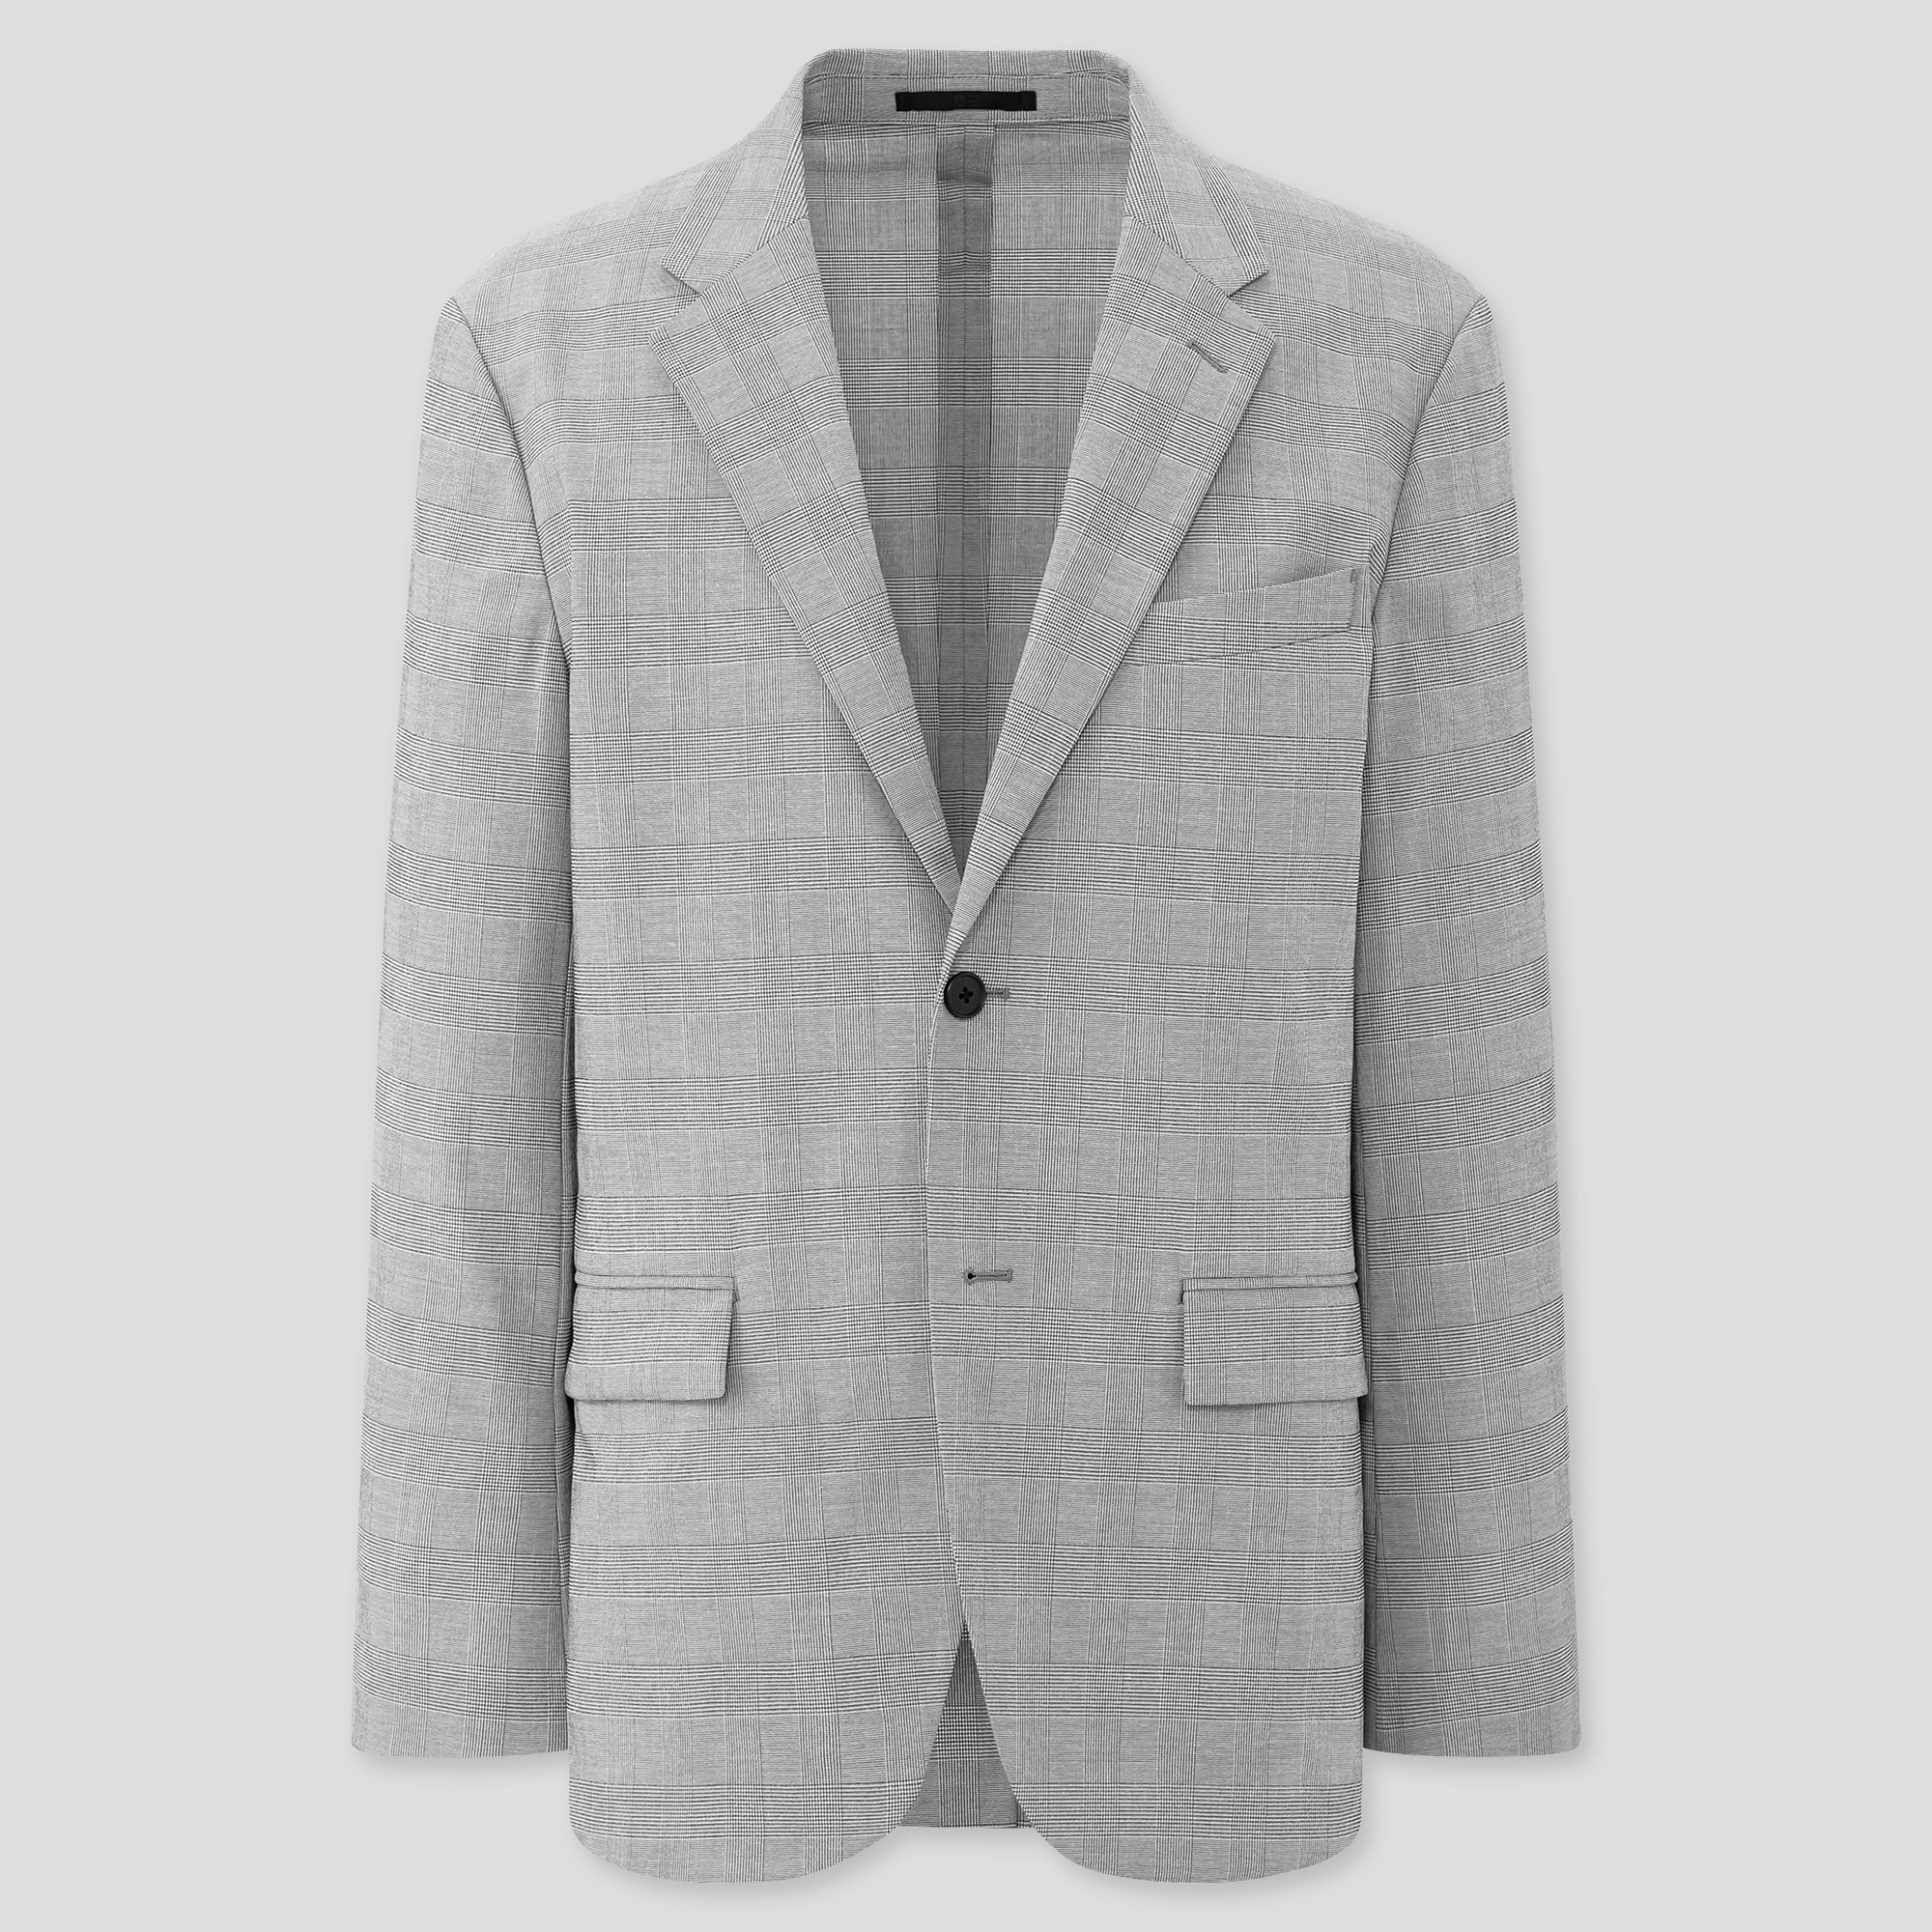 Men Kando Printed Blazer Jacket